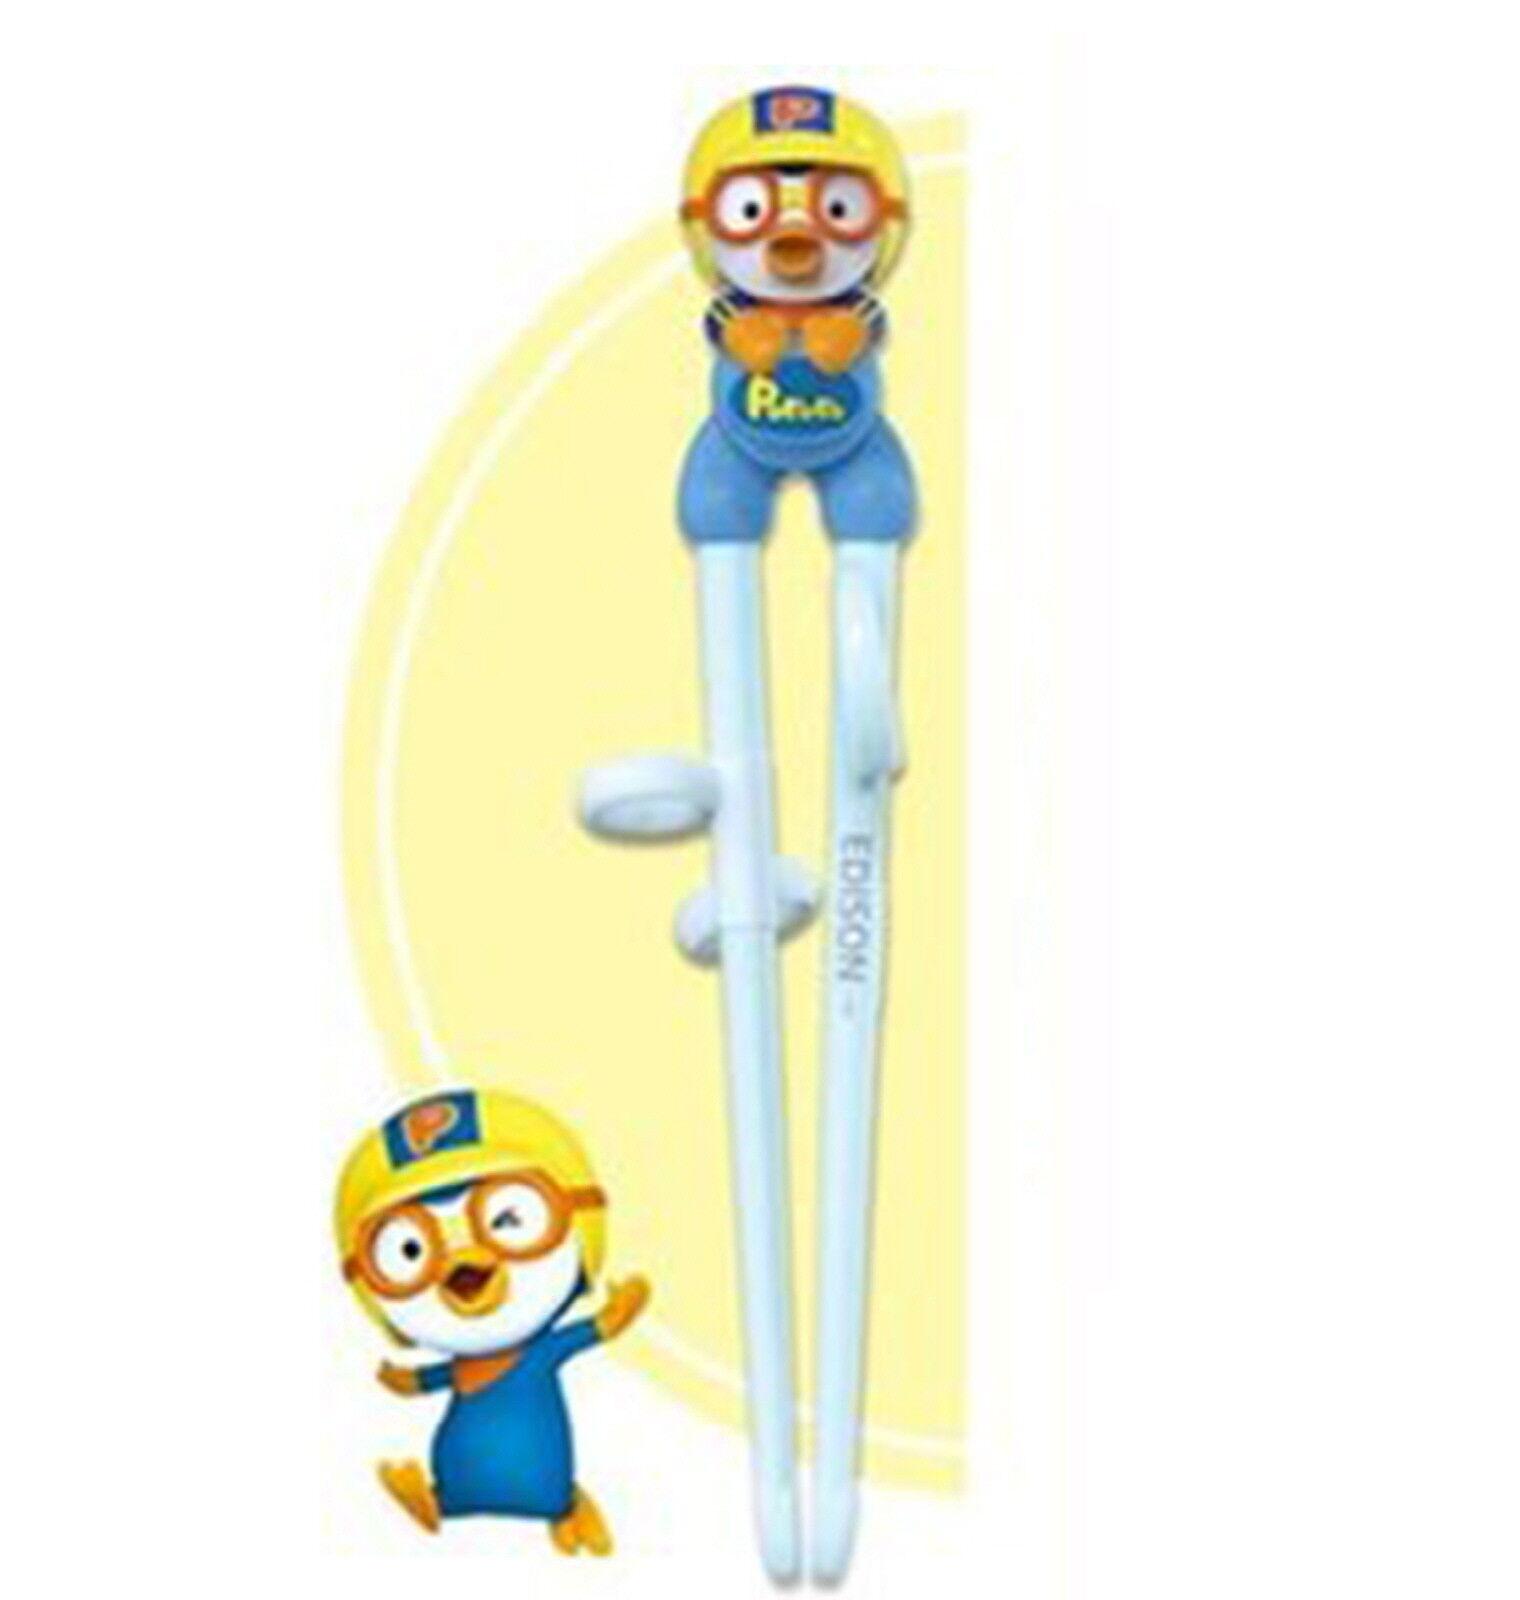 Edison Training Chopsticks Helper Pororo Character Kids Flatware Rightleft Hand